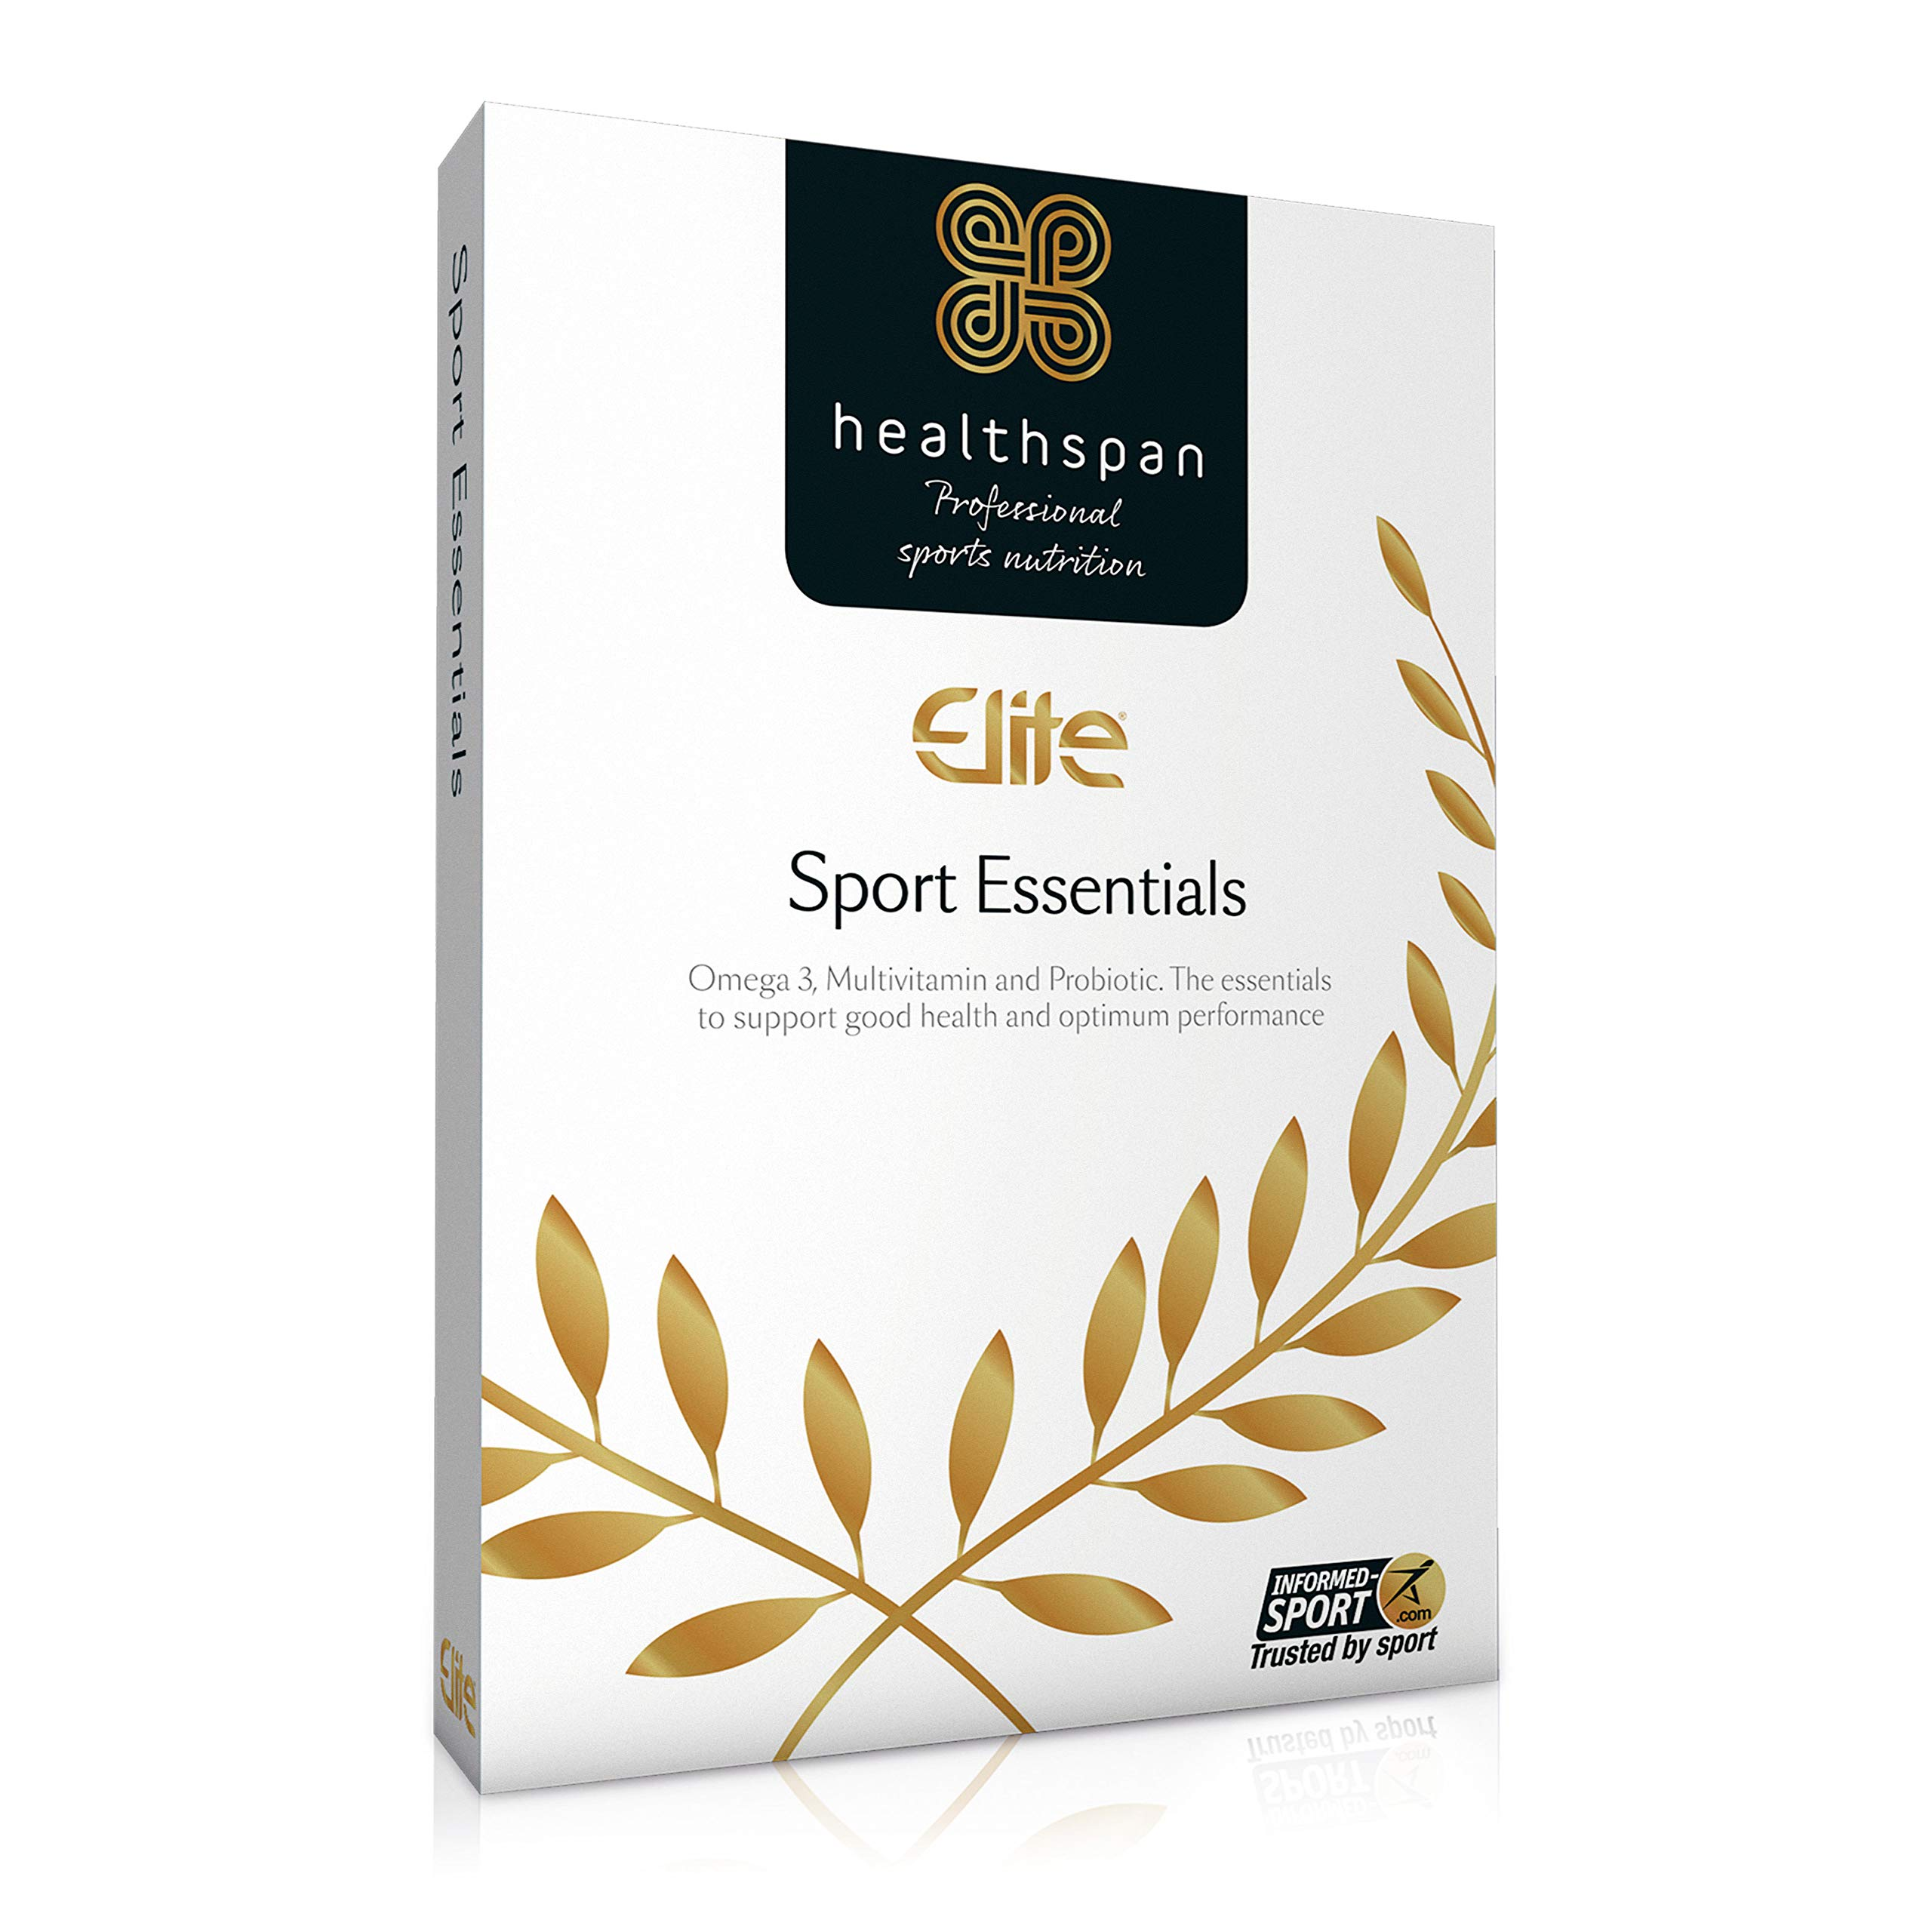 Sport Essentials | Healthspan Elite | 28 Day Supply | All Blacks Official Partner | with Vitamin C & Vitamin D3 | Informed Sport Accredited | Multivitamin | Omega 3 | Probiotic